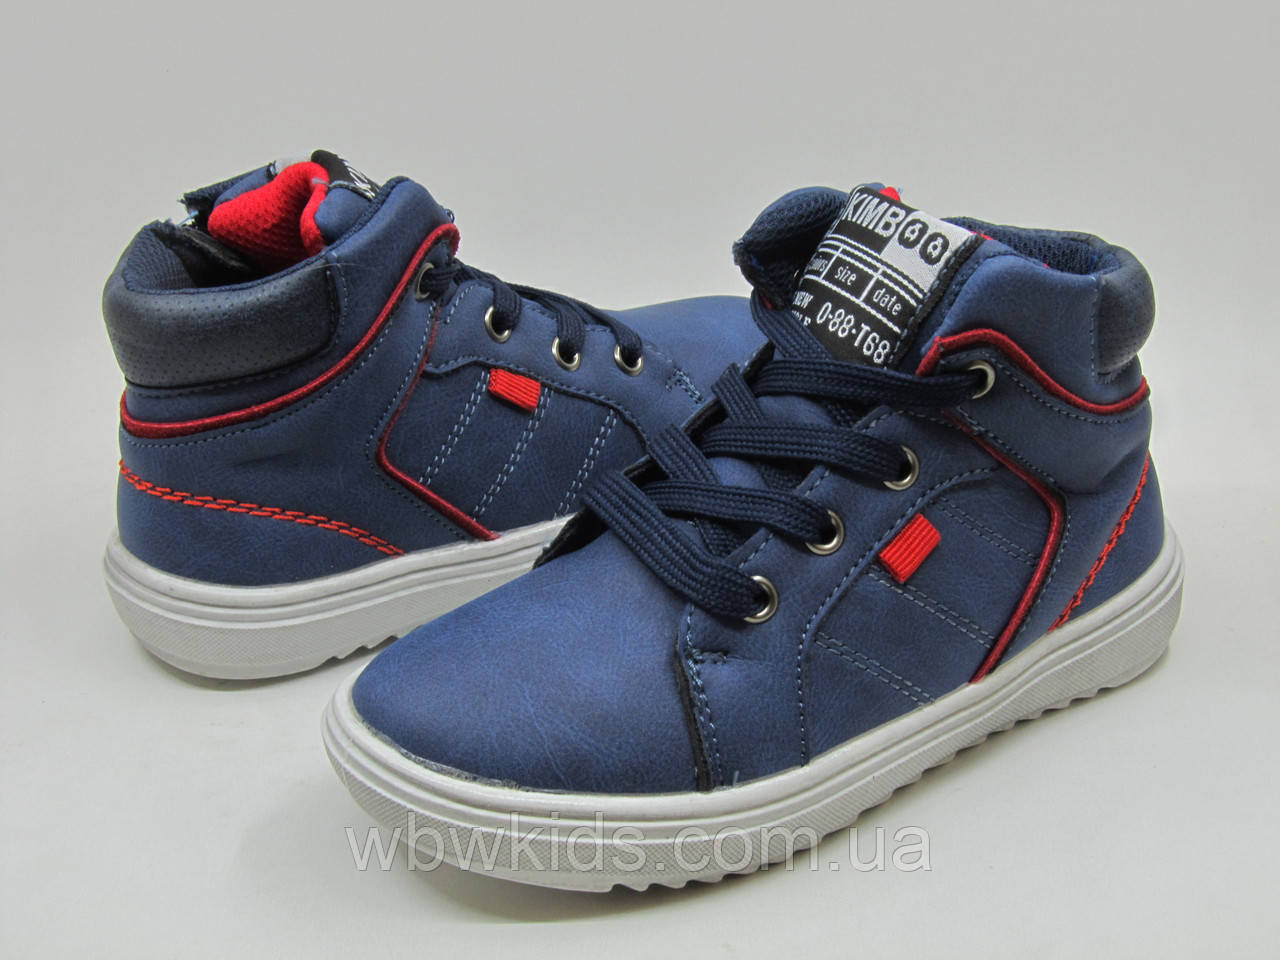 Ботинки детские Kimboo JN164-2K синие на мальчика